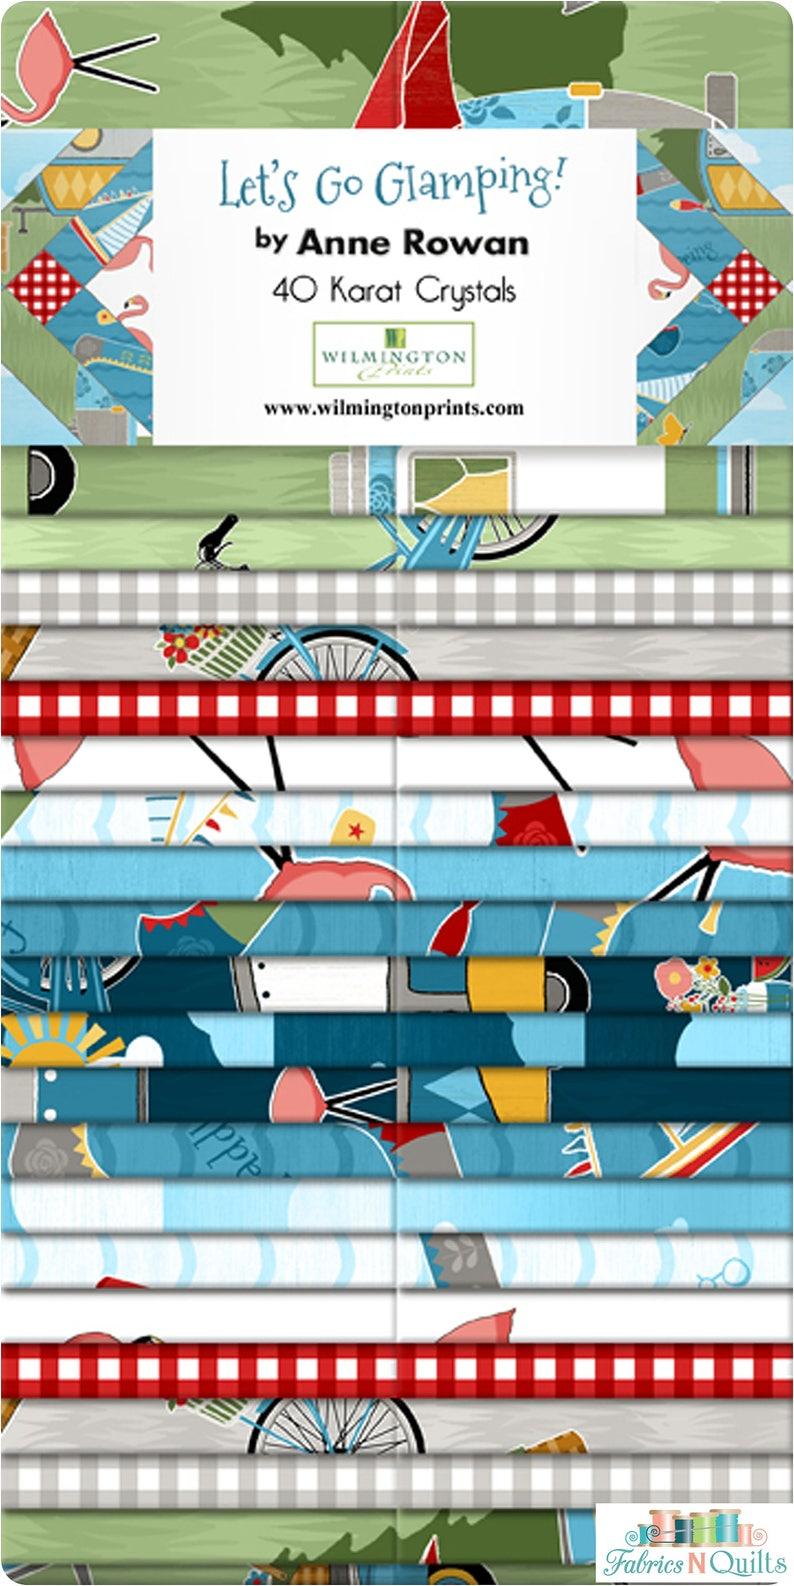 Precut Jelly Strips-2.5 inch Fabric Roll-Lets Go Glamping-Wilminton Prints-Ann Rowan